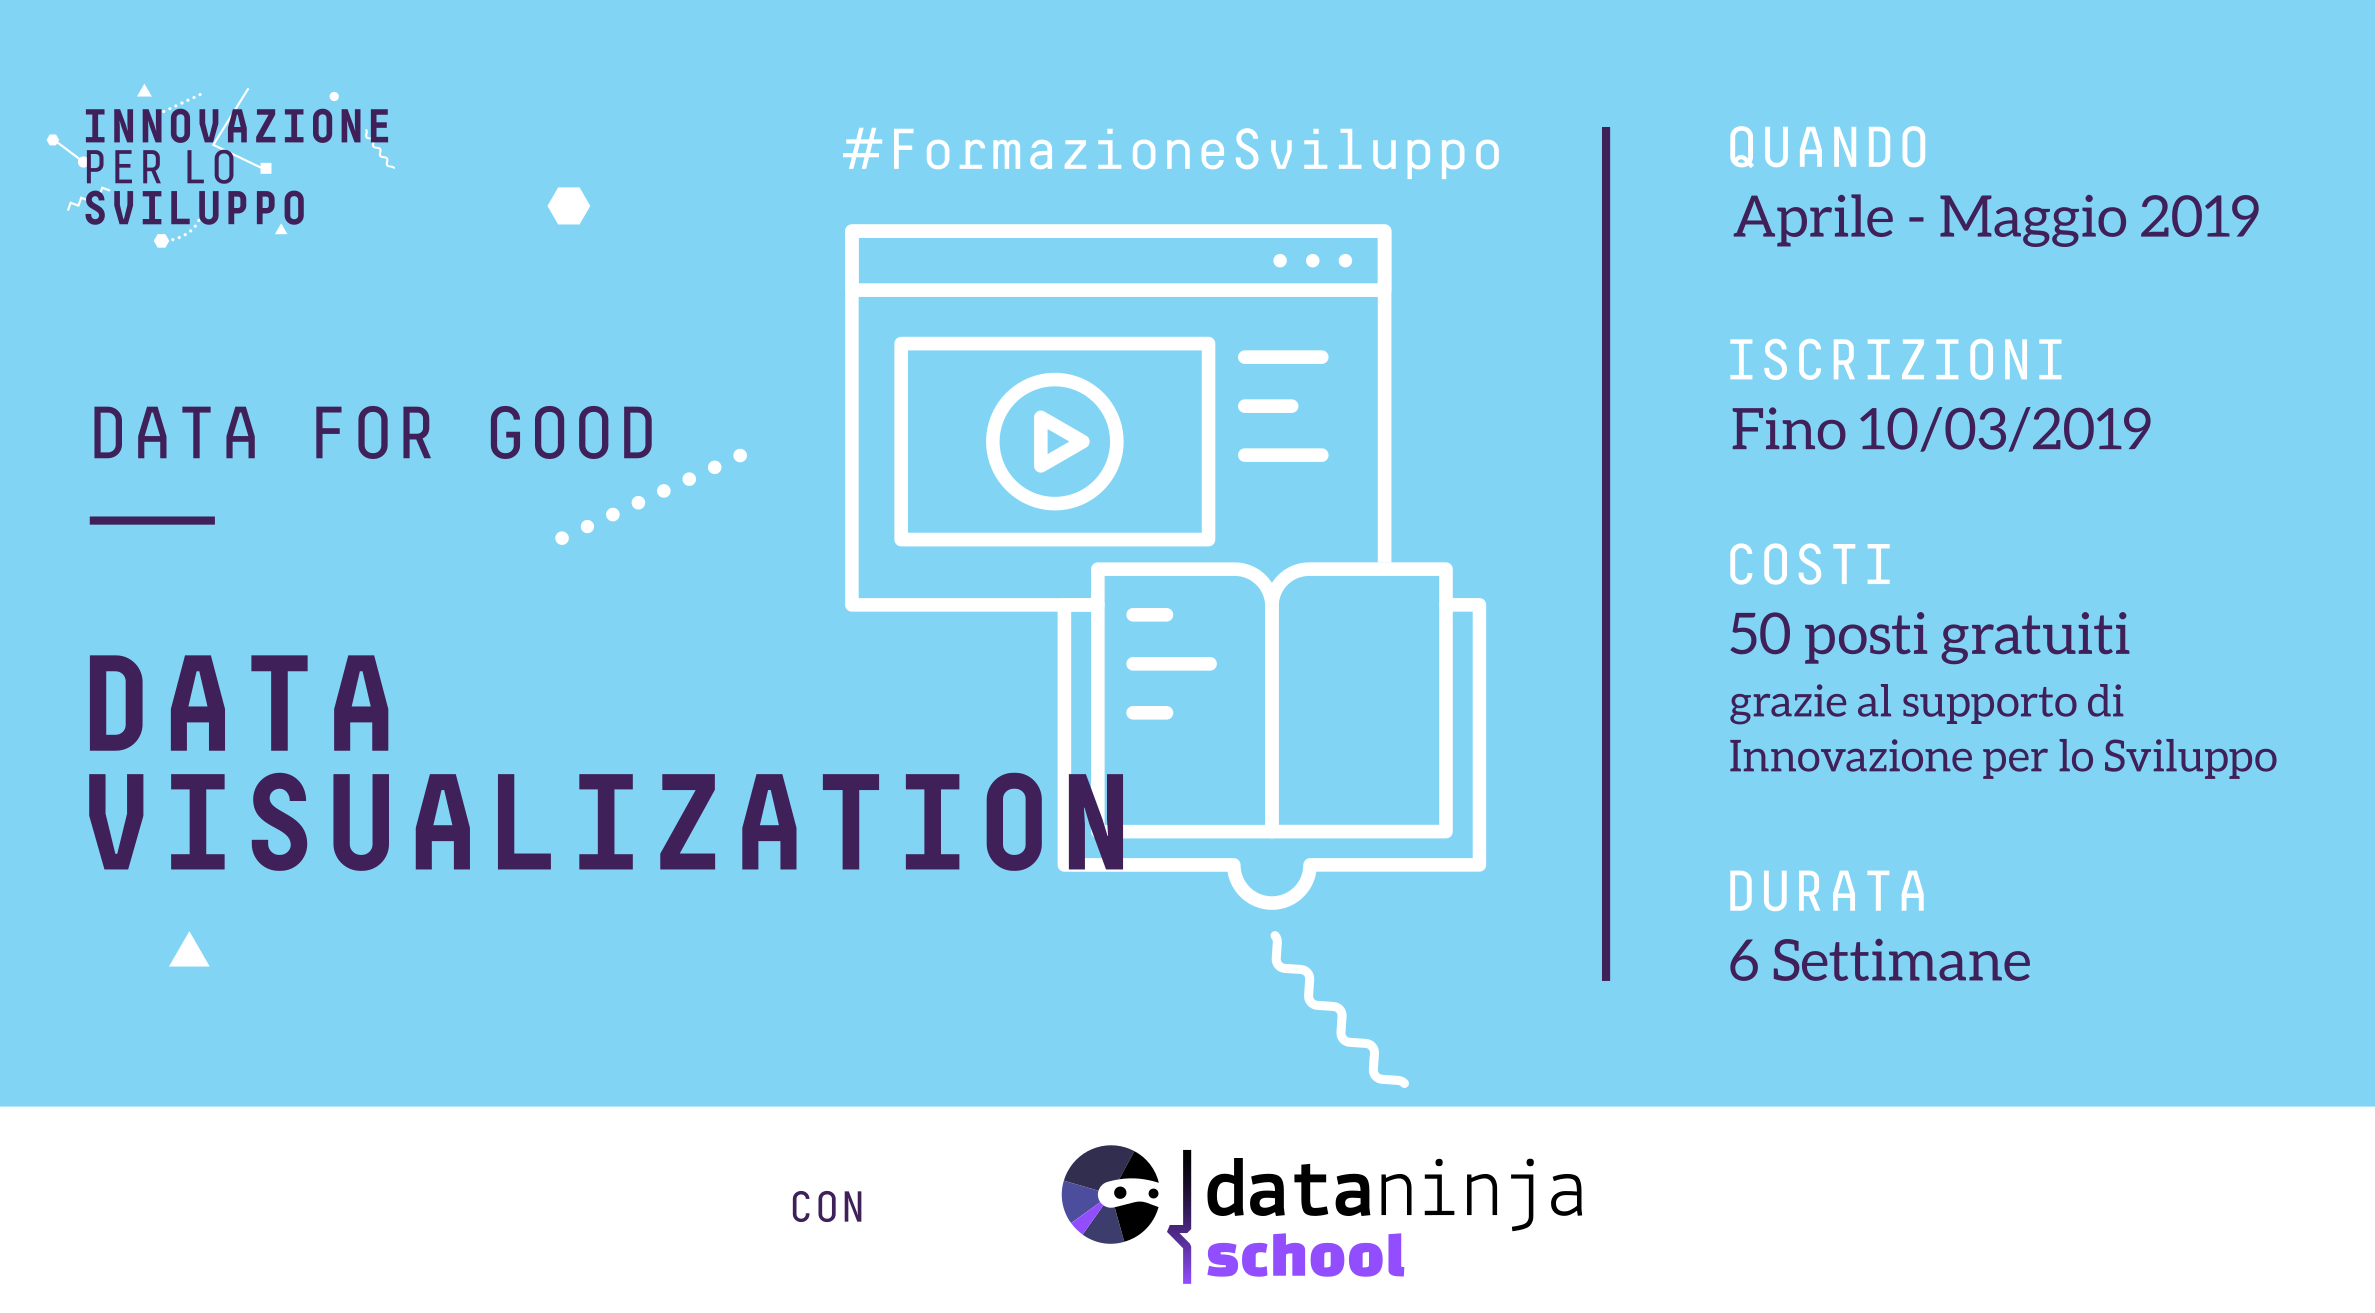 Data for Good: Data Visualization